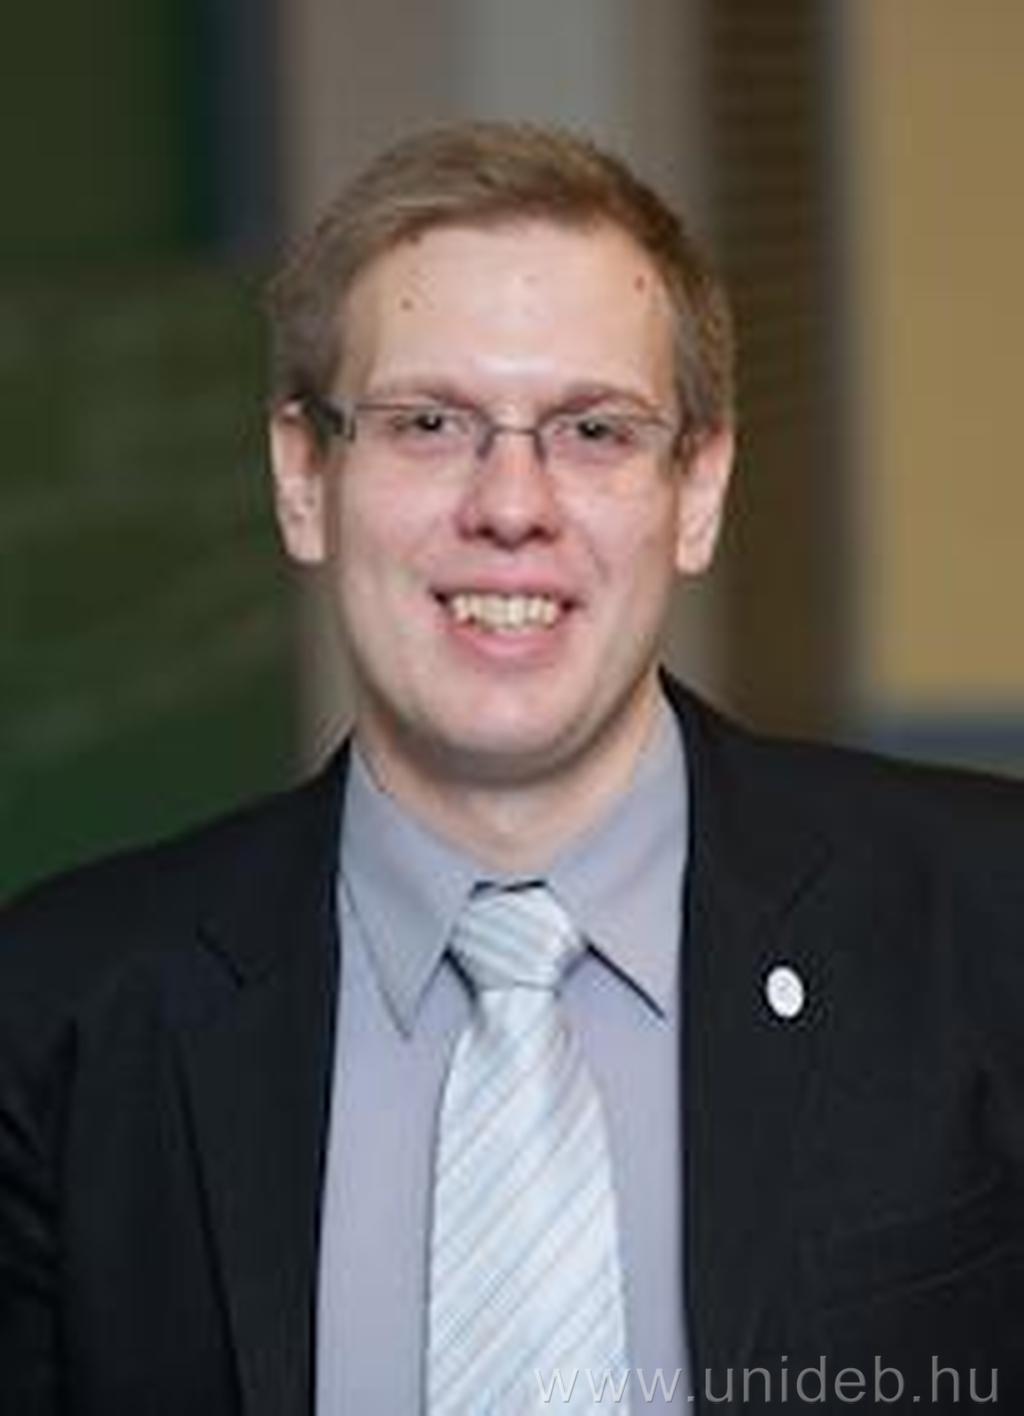 Dr. Márton Leó ZACCARIA